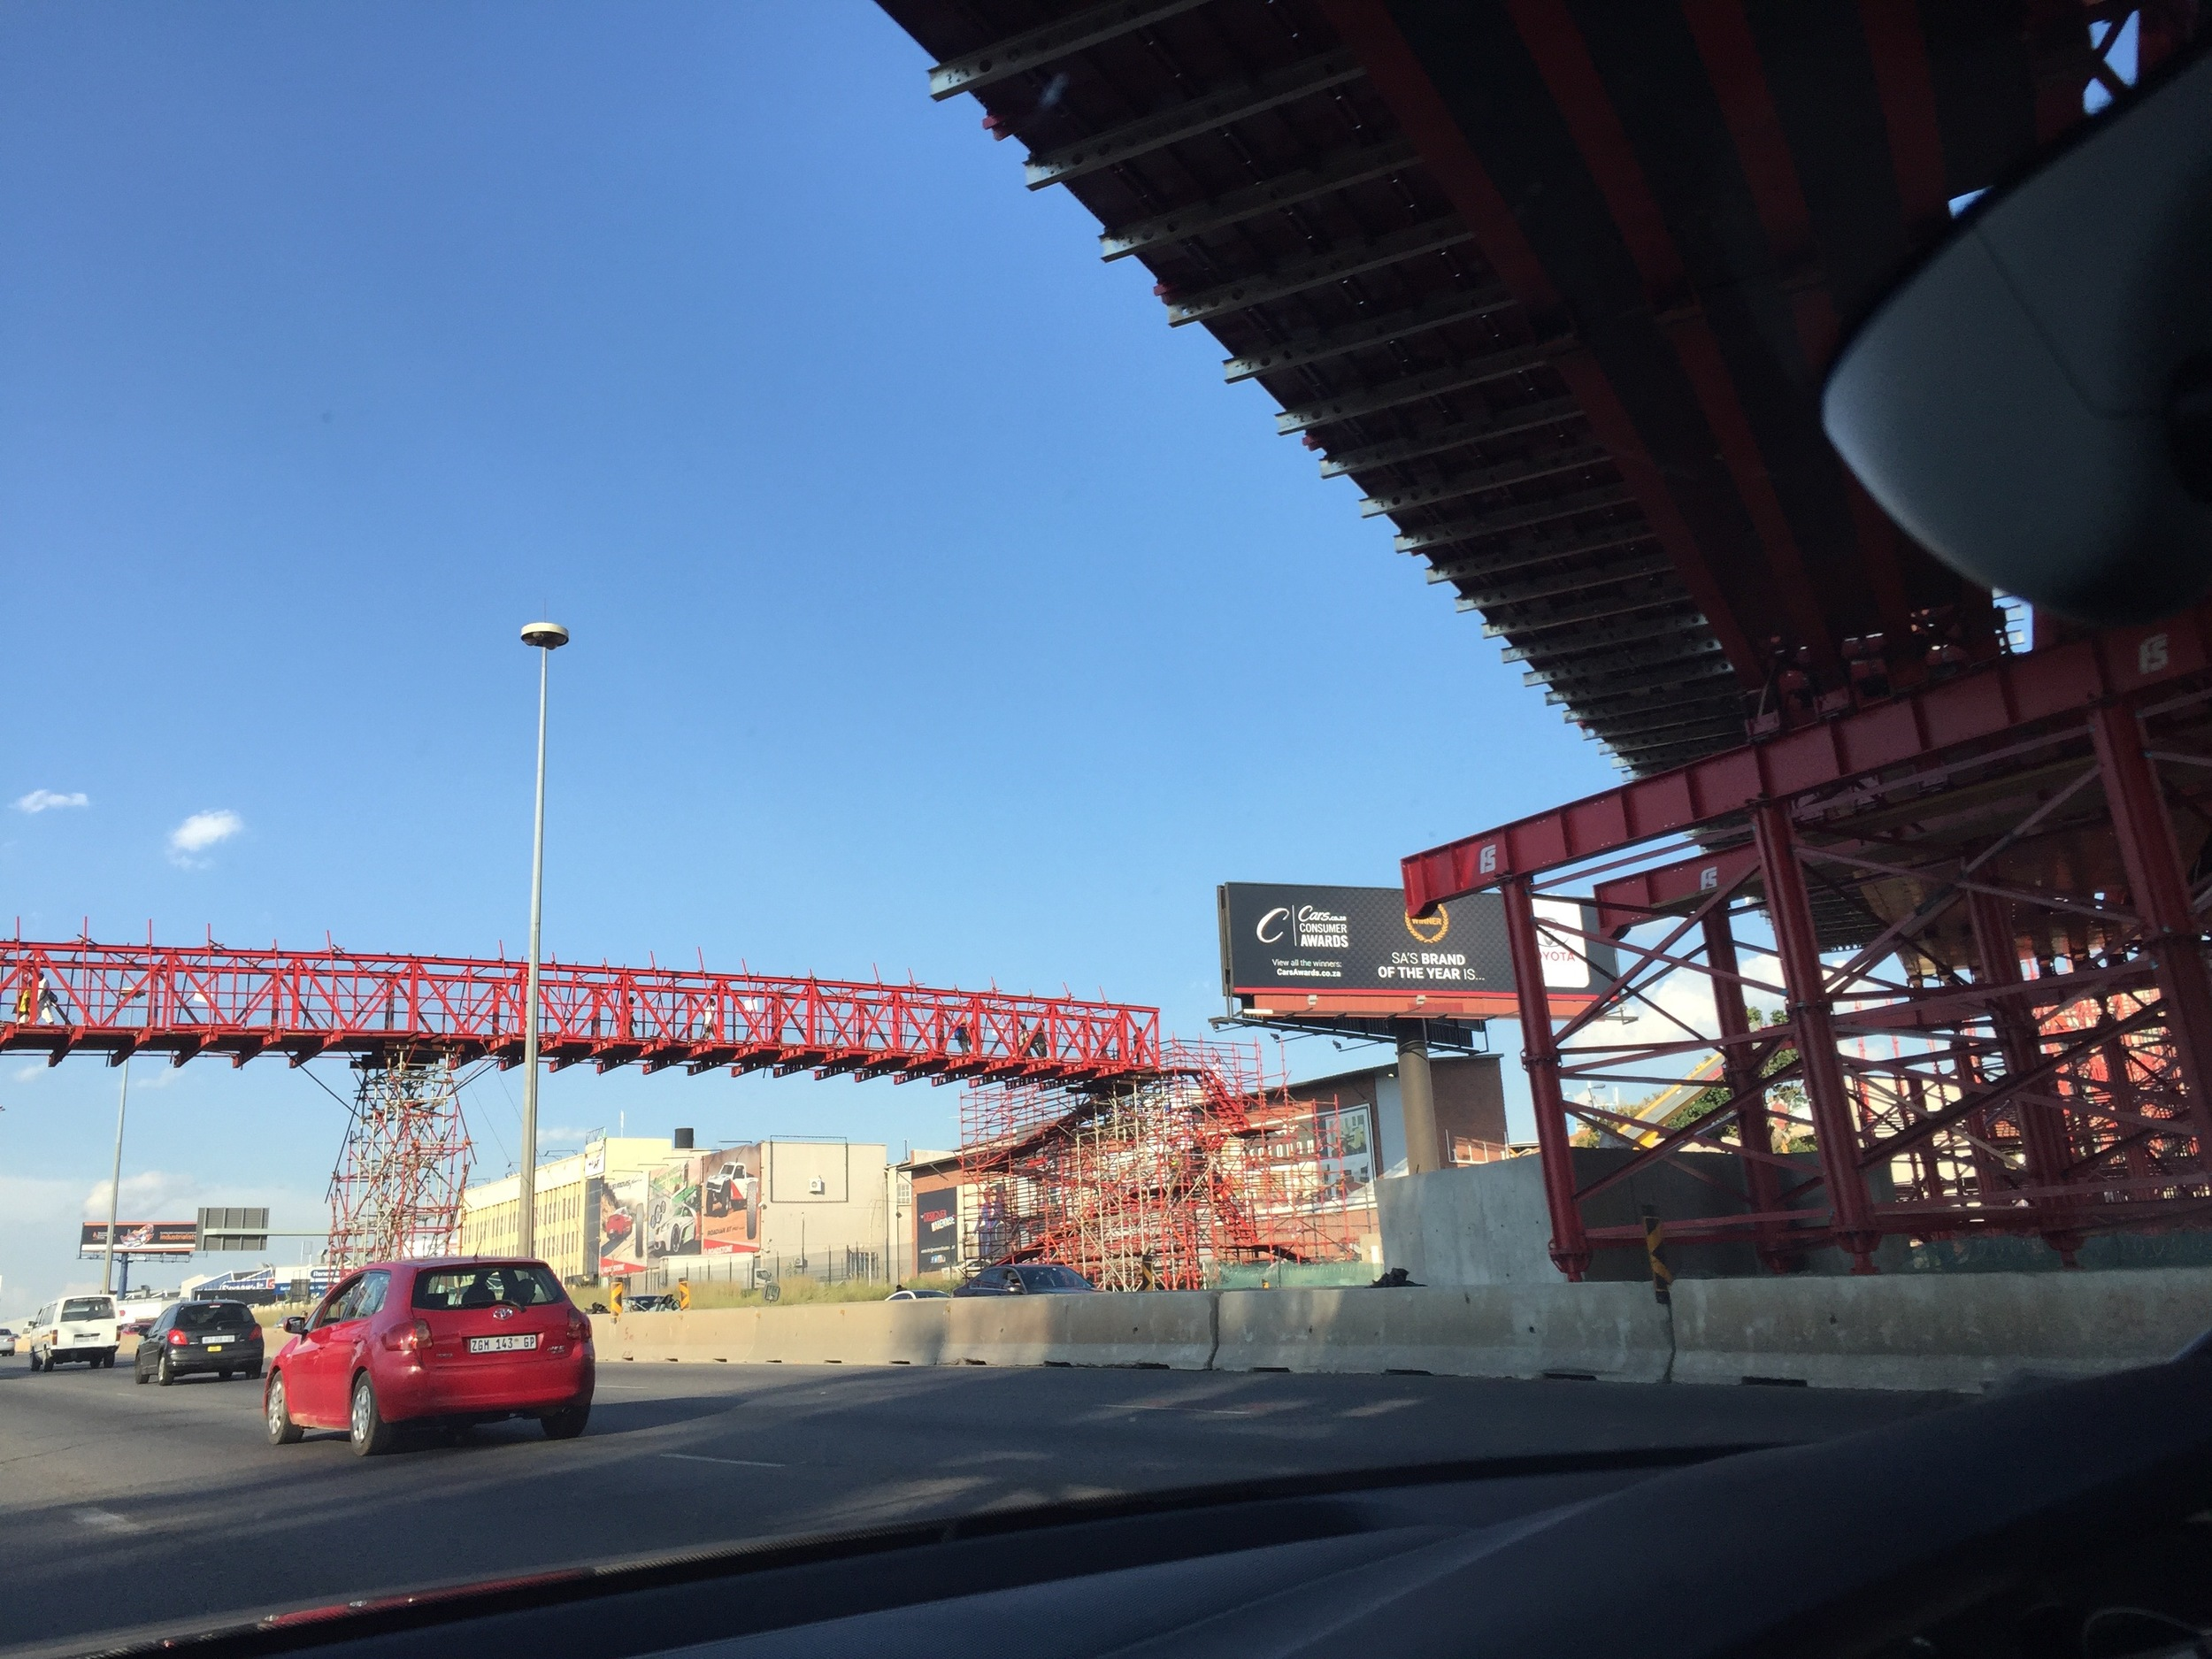 A walkway bridge made out of scaffolding. Eeek!!!